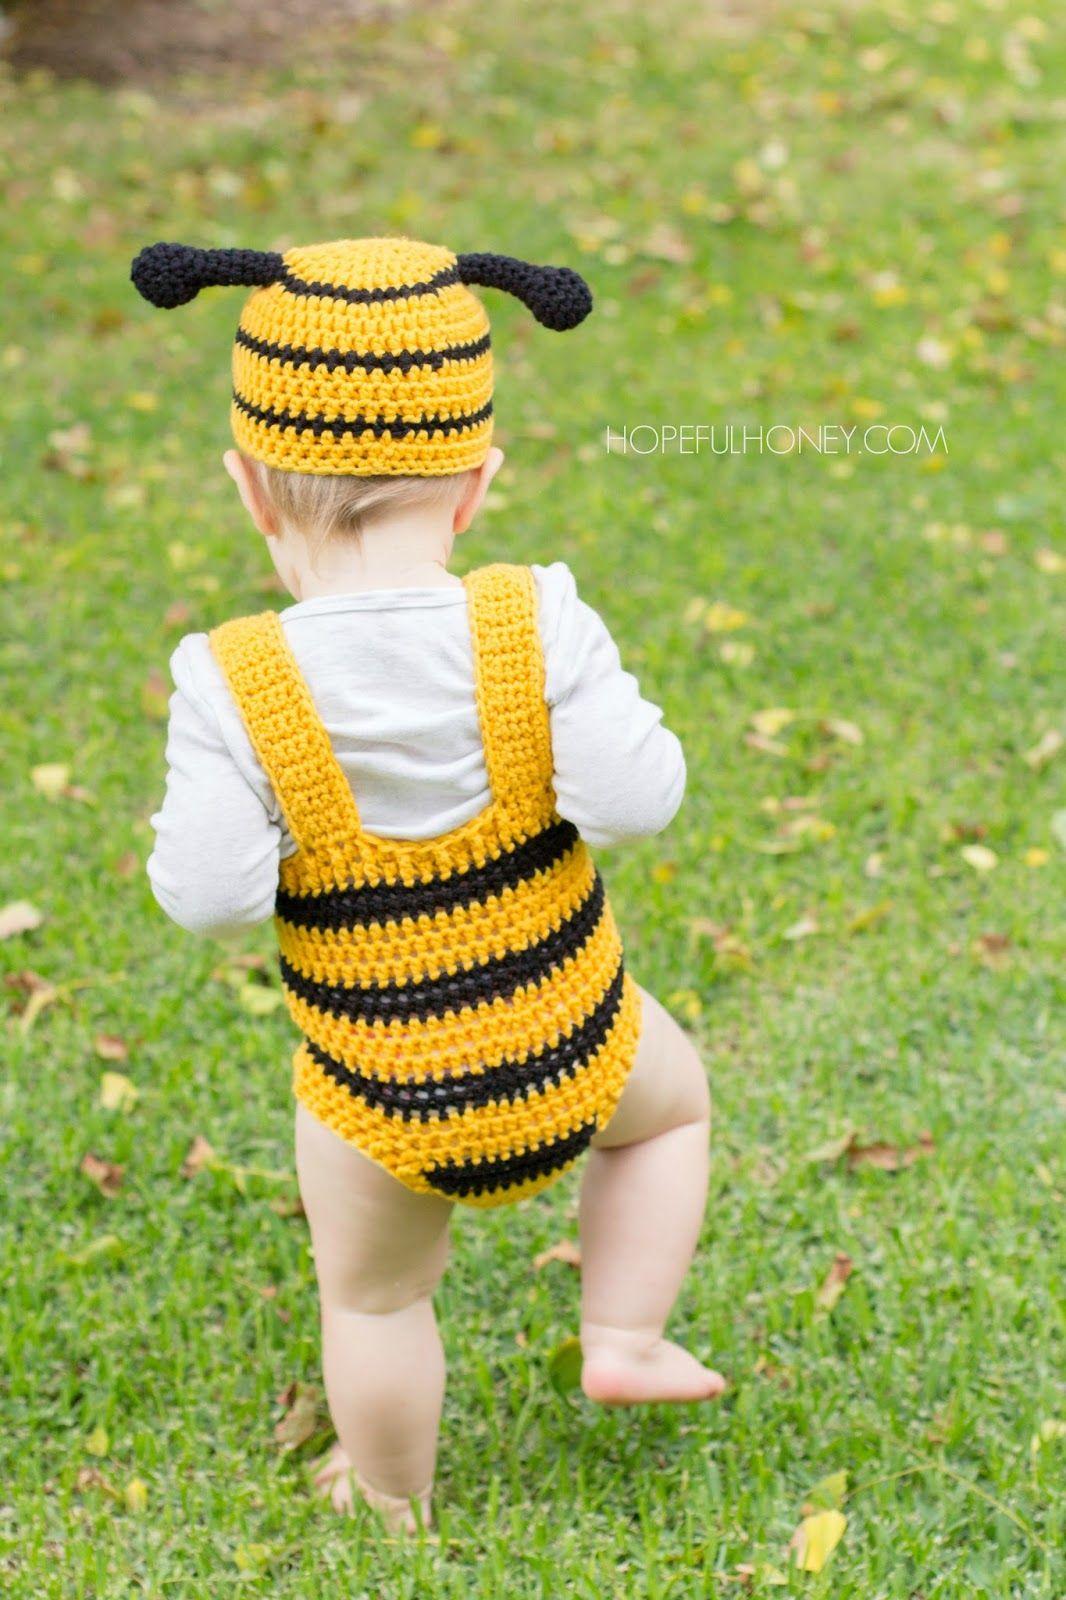 deebc3e10 Bumble Bee Baby Hat   Playsuit Set Crochet Pattern